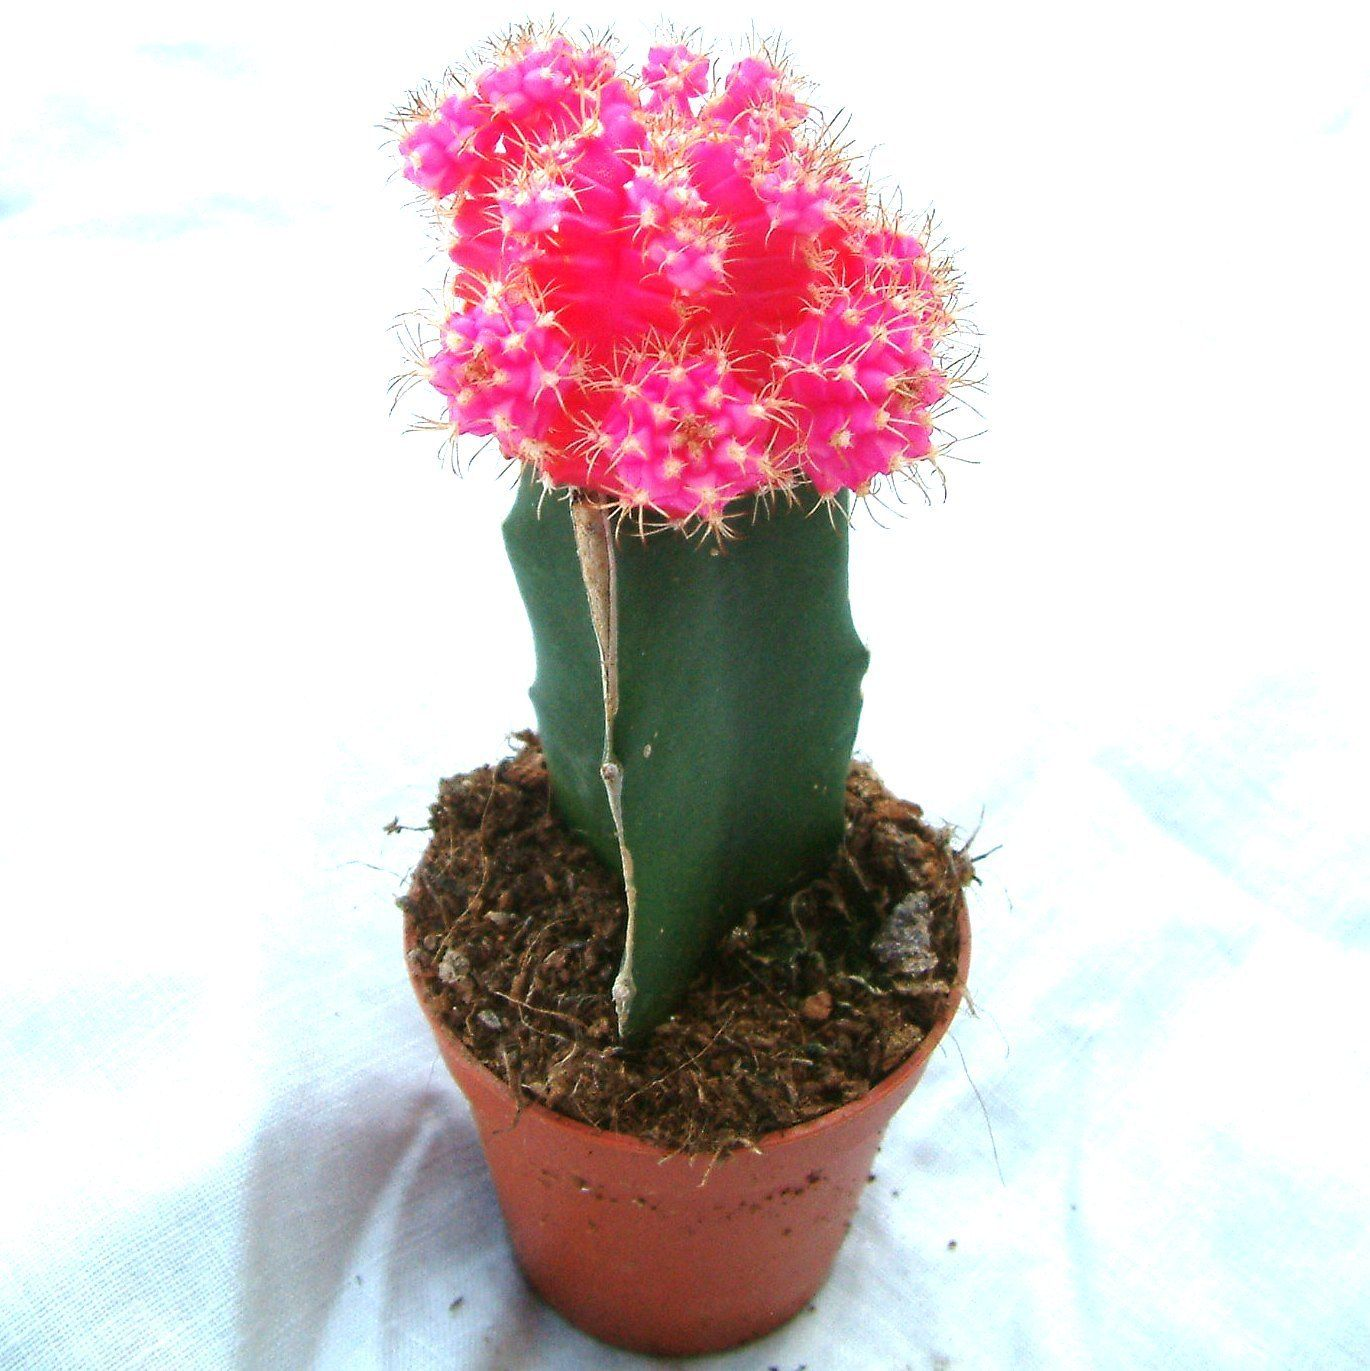 Pink Cactus Plant Ikea Cactaceae Grafted Cactus Grafted Cactus